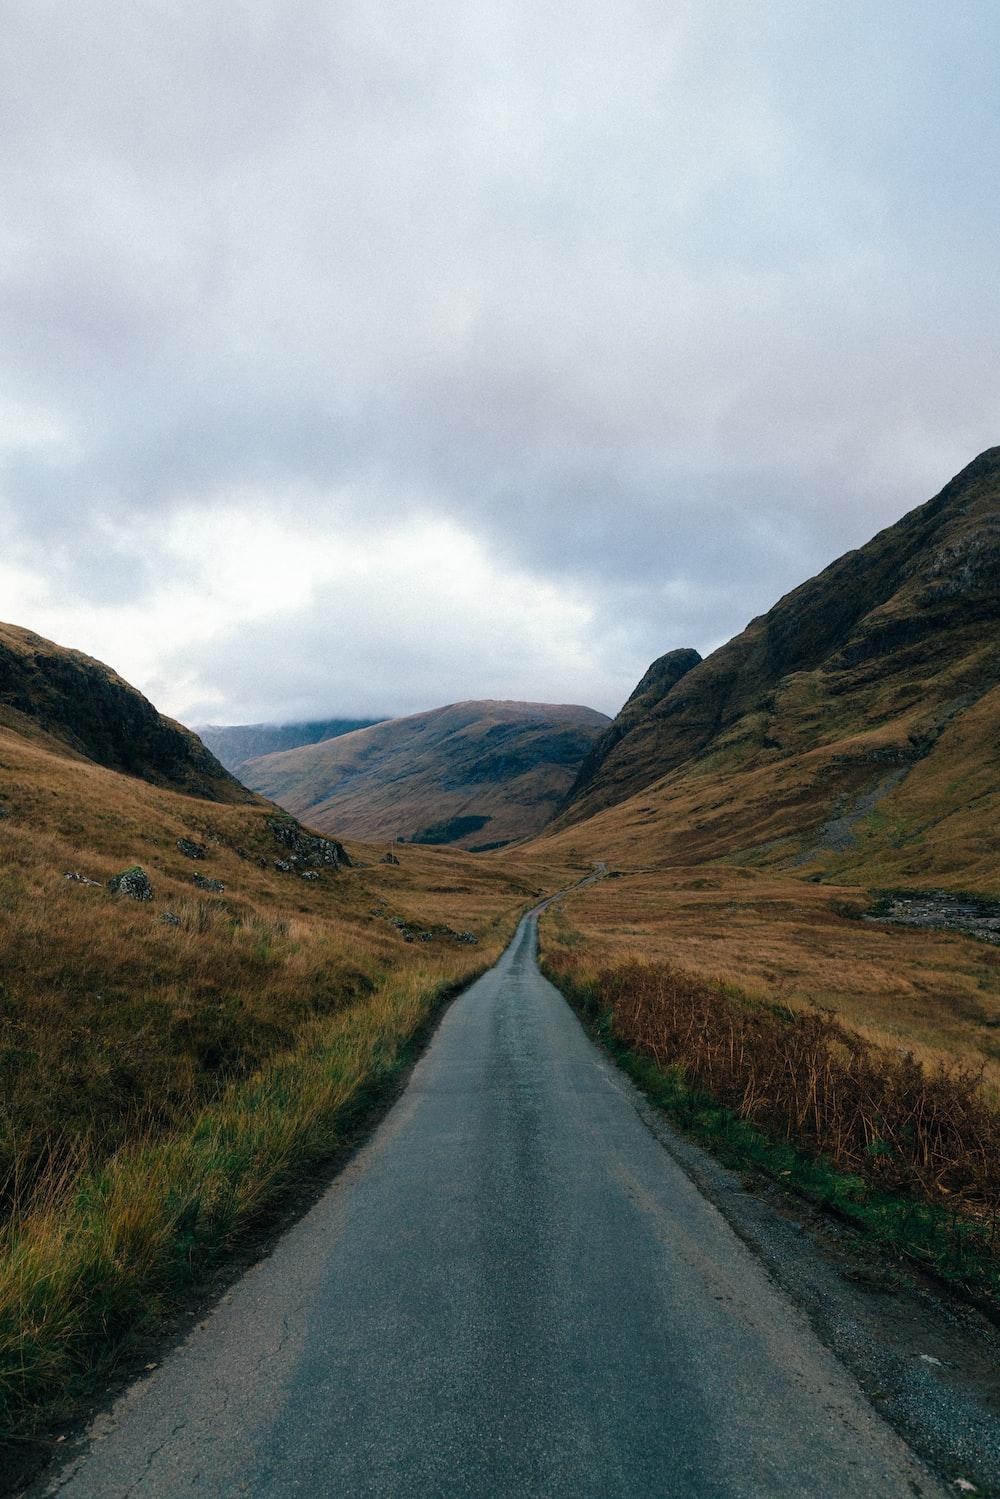 empty road between brown mountains under blue sky